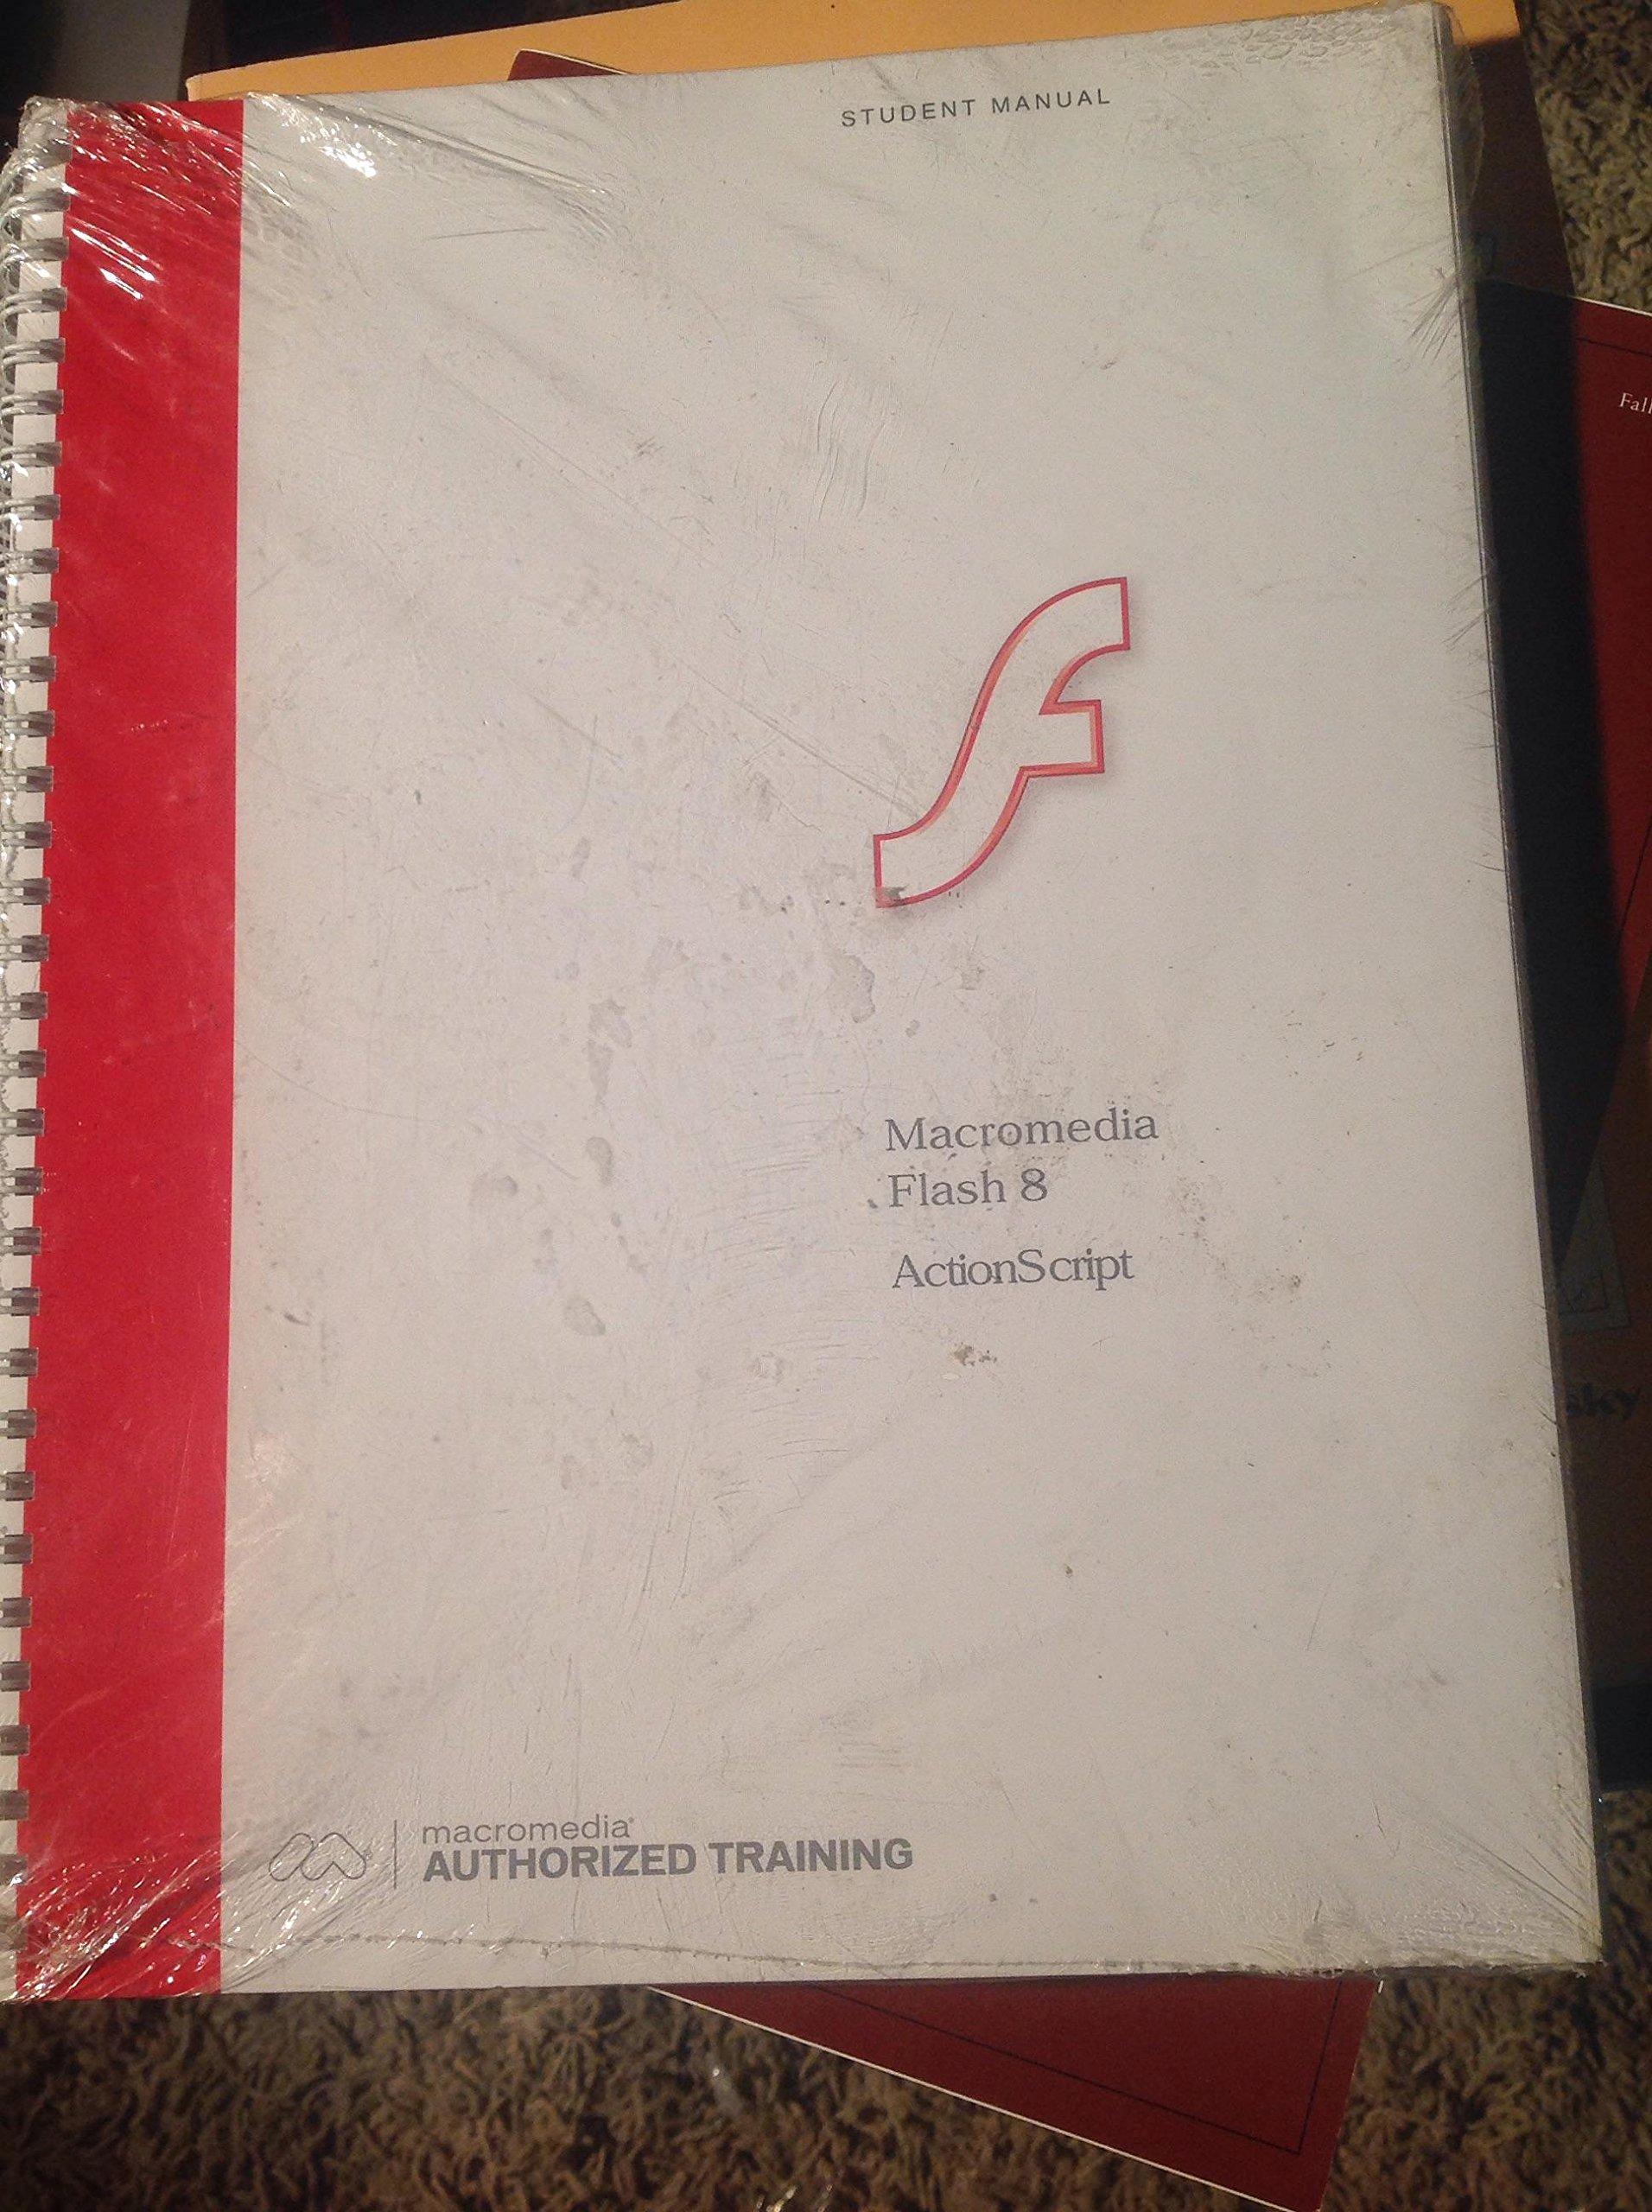 macromedia flash 8 actionscript student manual macromedia rh amazon com macromedia flash 8 lab manual manual macromedia flash 8